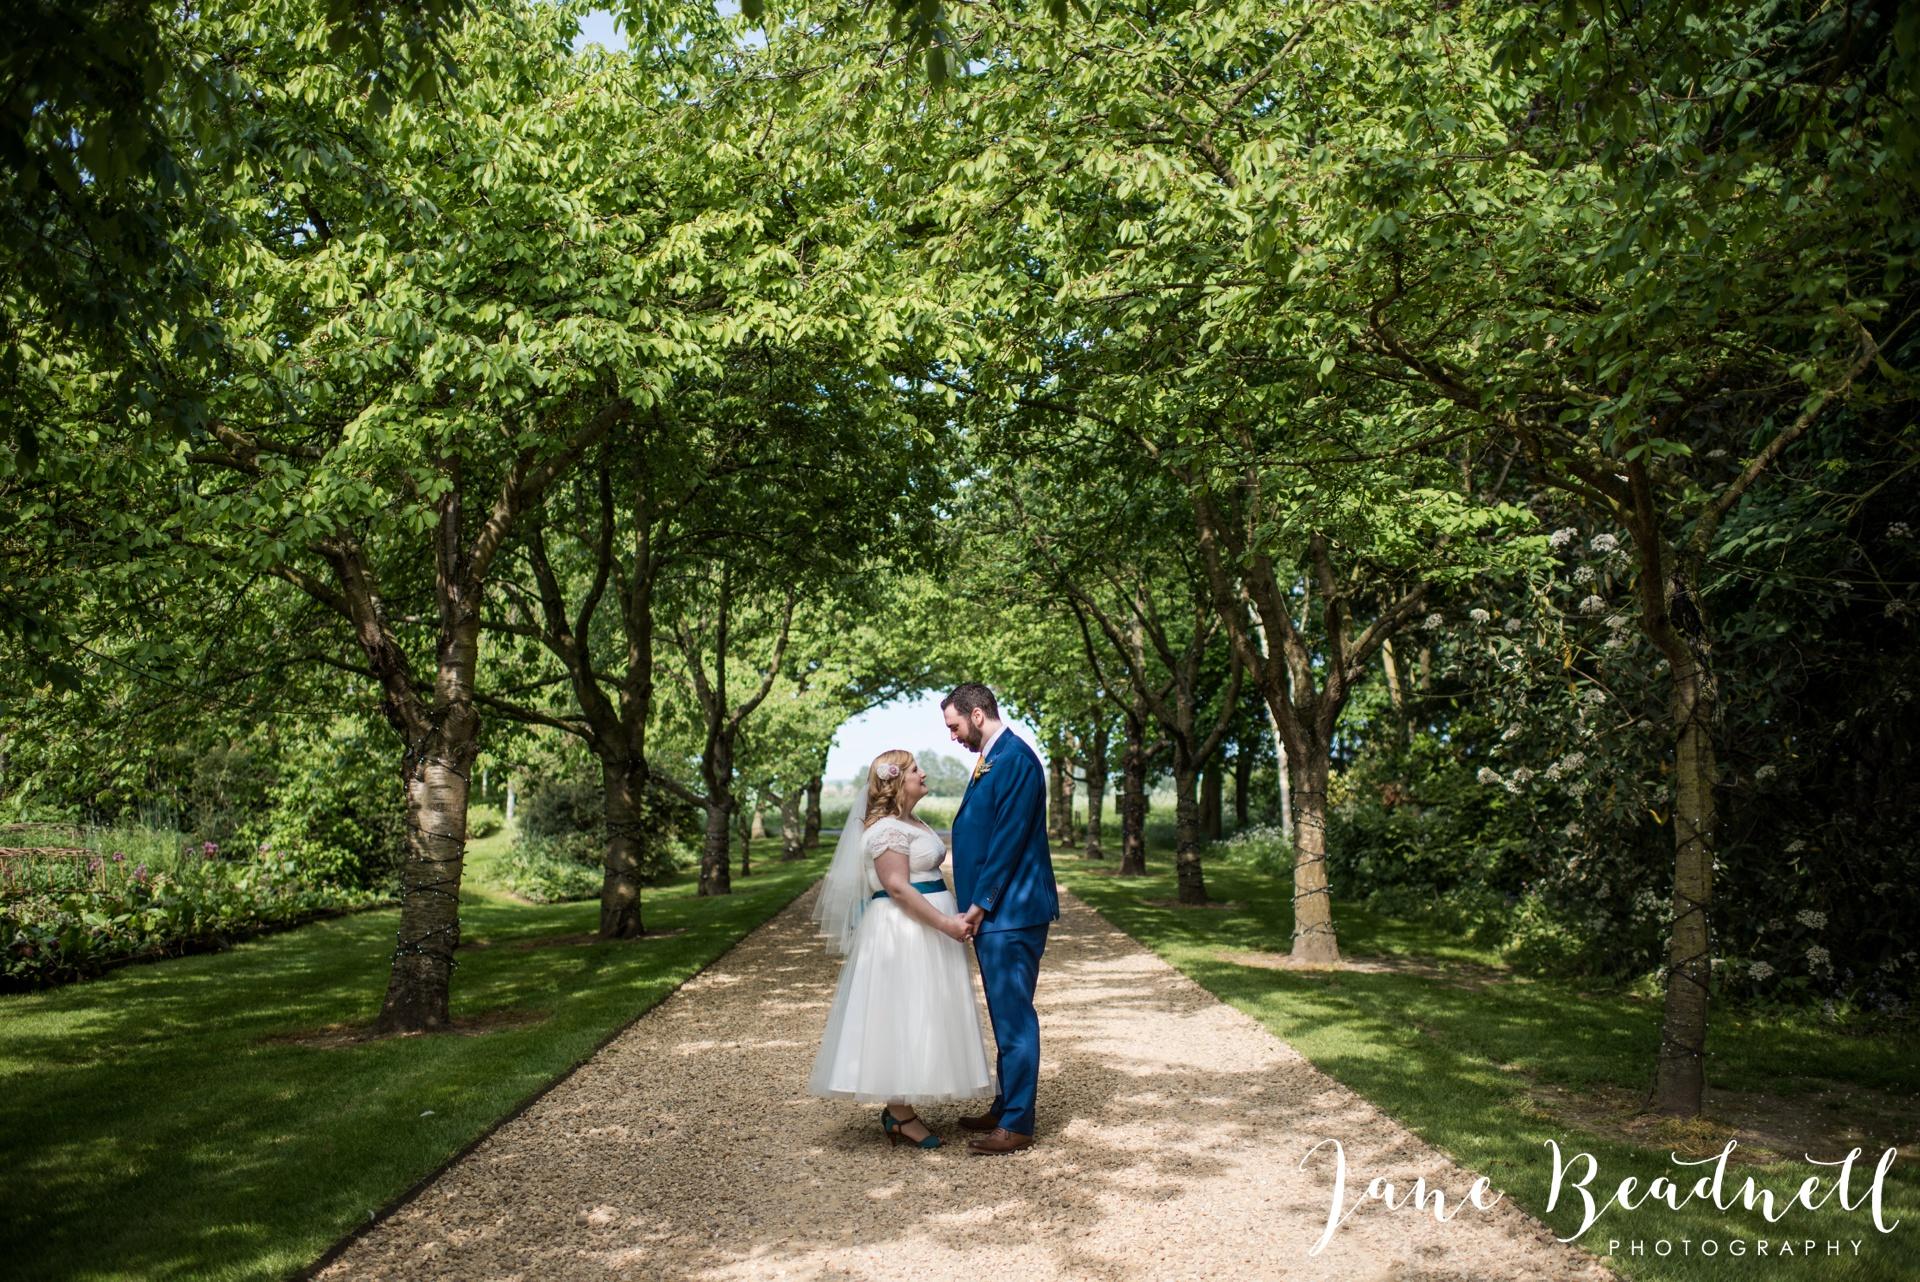 South Farm Wedding photography Hertfordshire by Jane Beadnell Photography fine art wedding photographer_0110